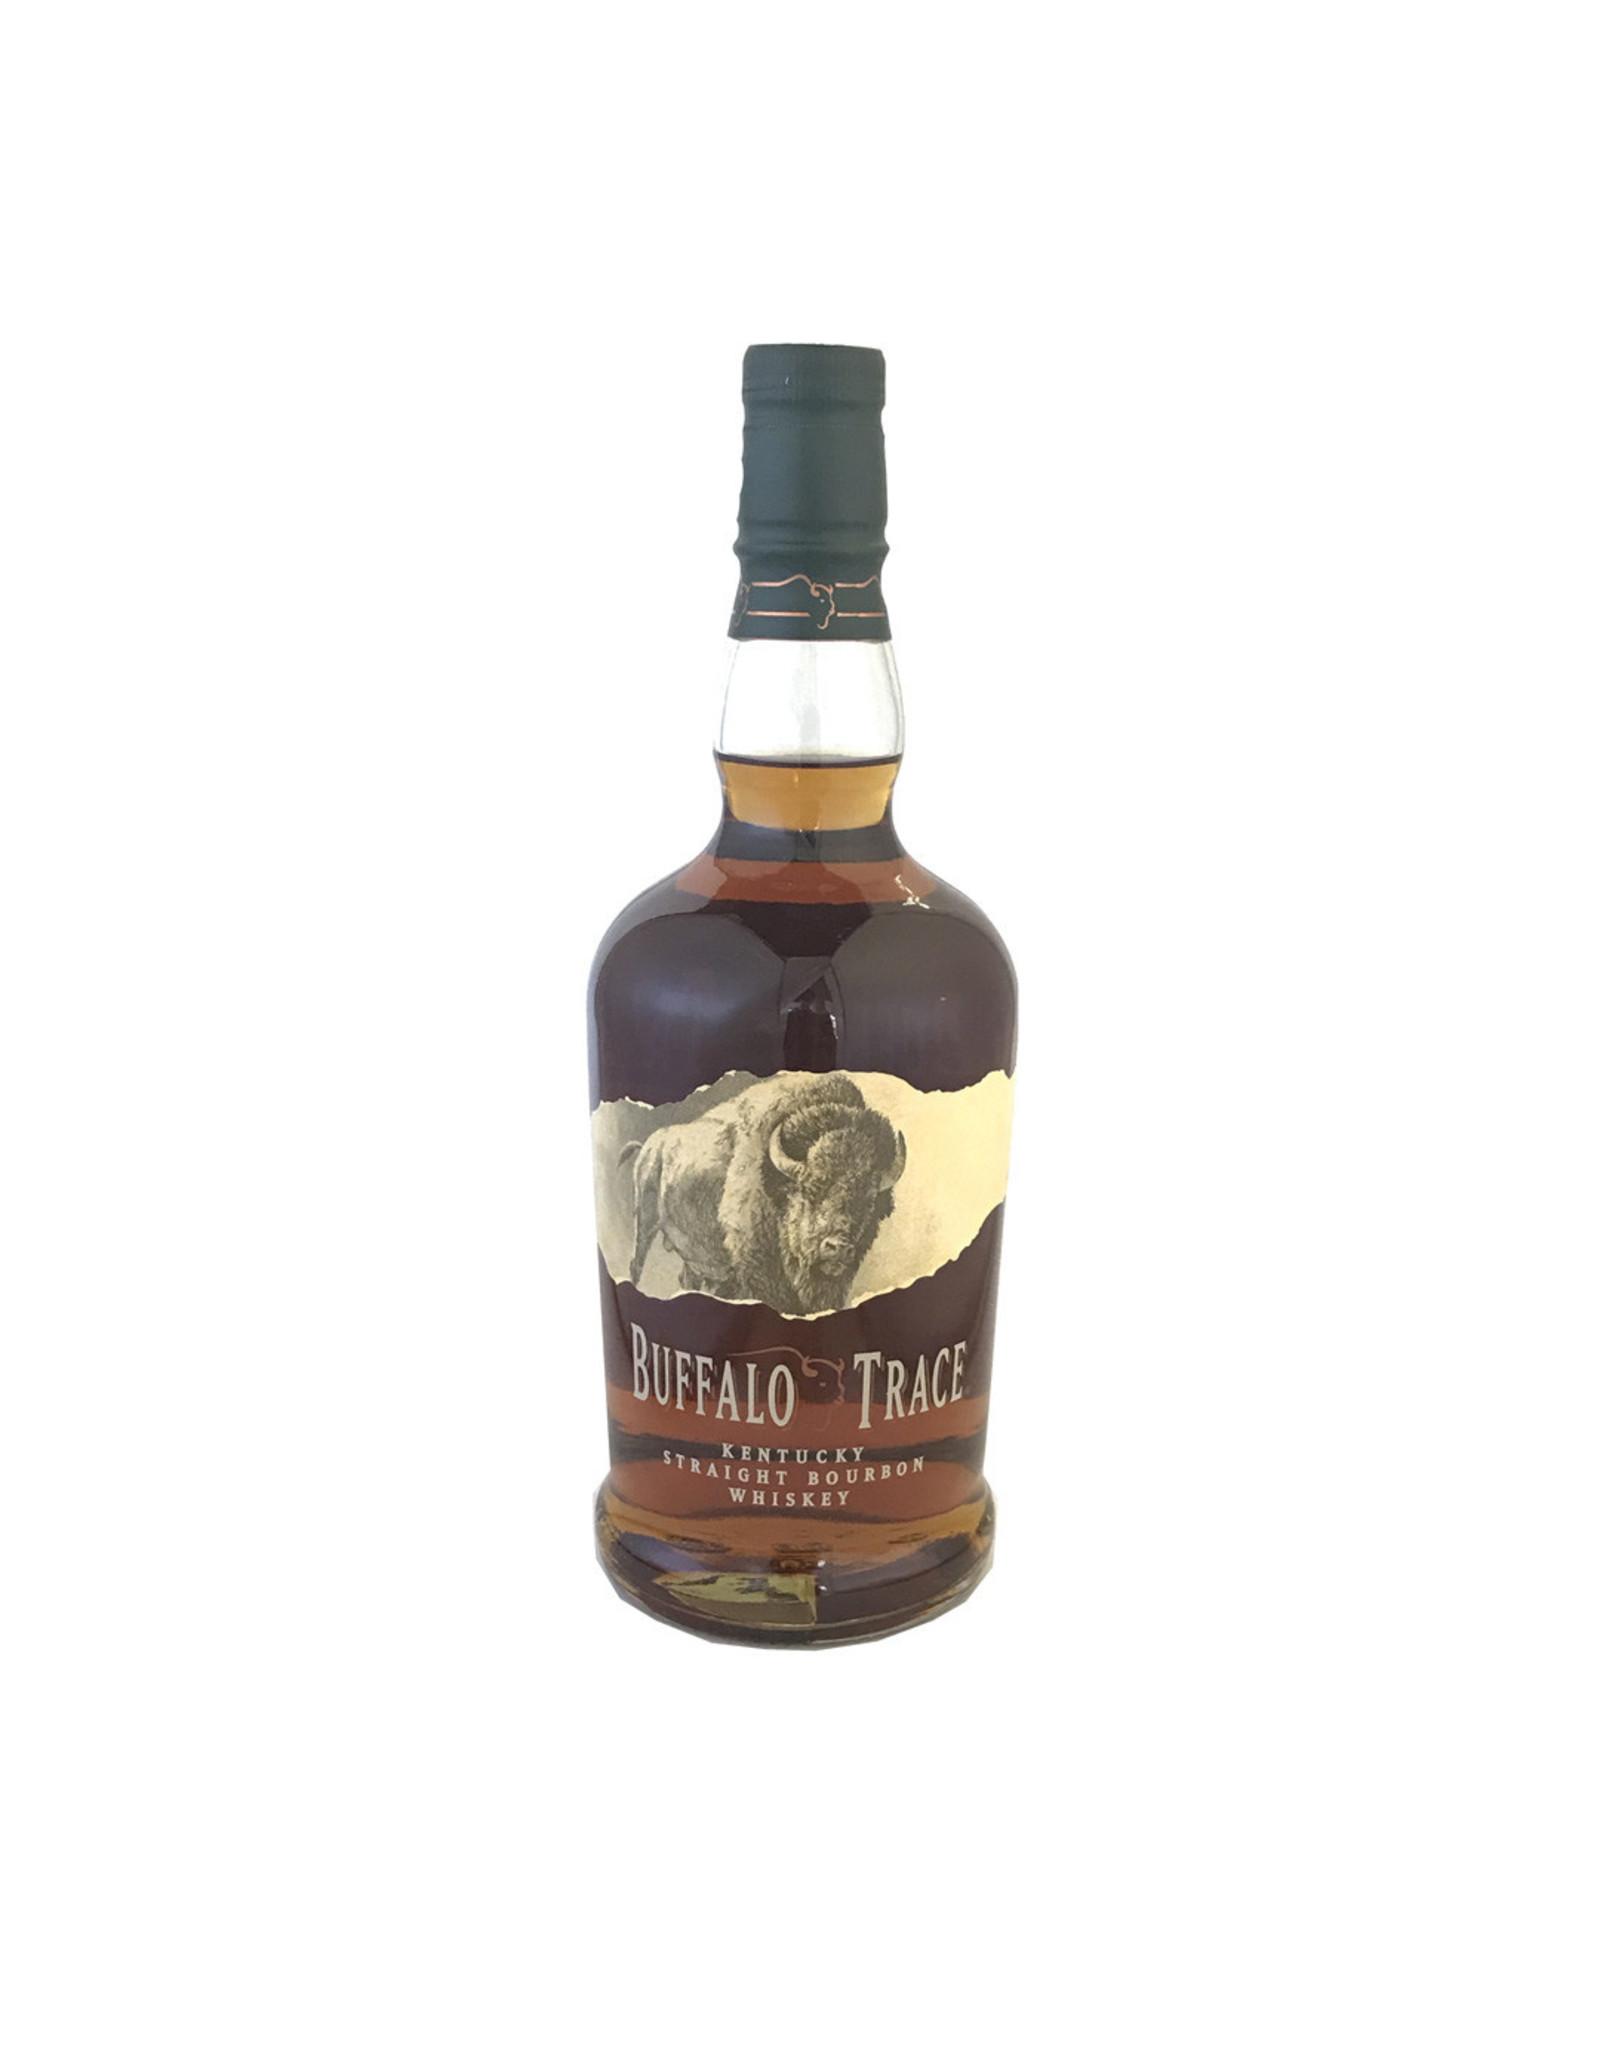 Buffalo Trace Distillery Straight Bourbon Whiskey, Kentucky